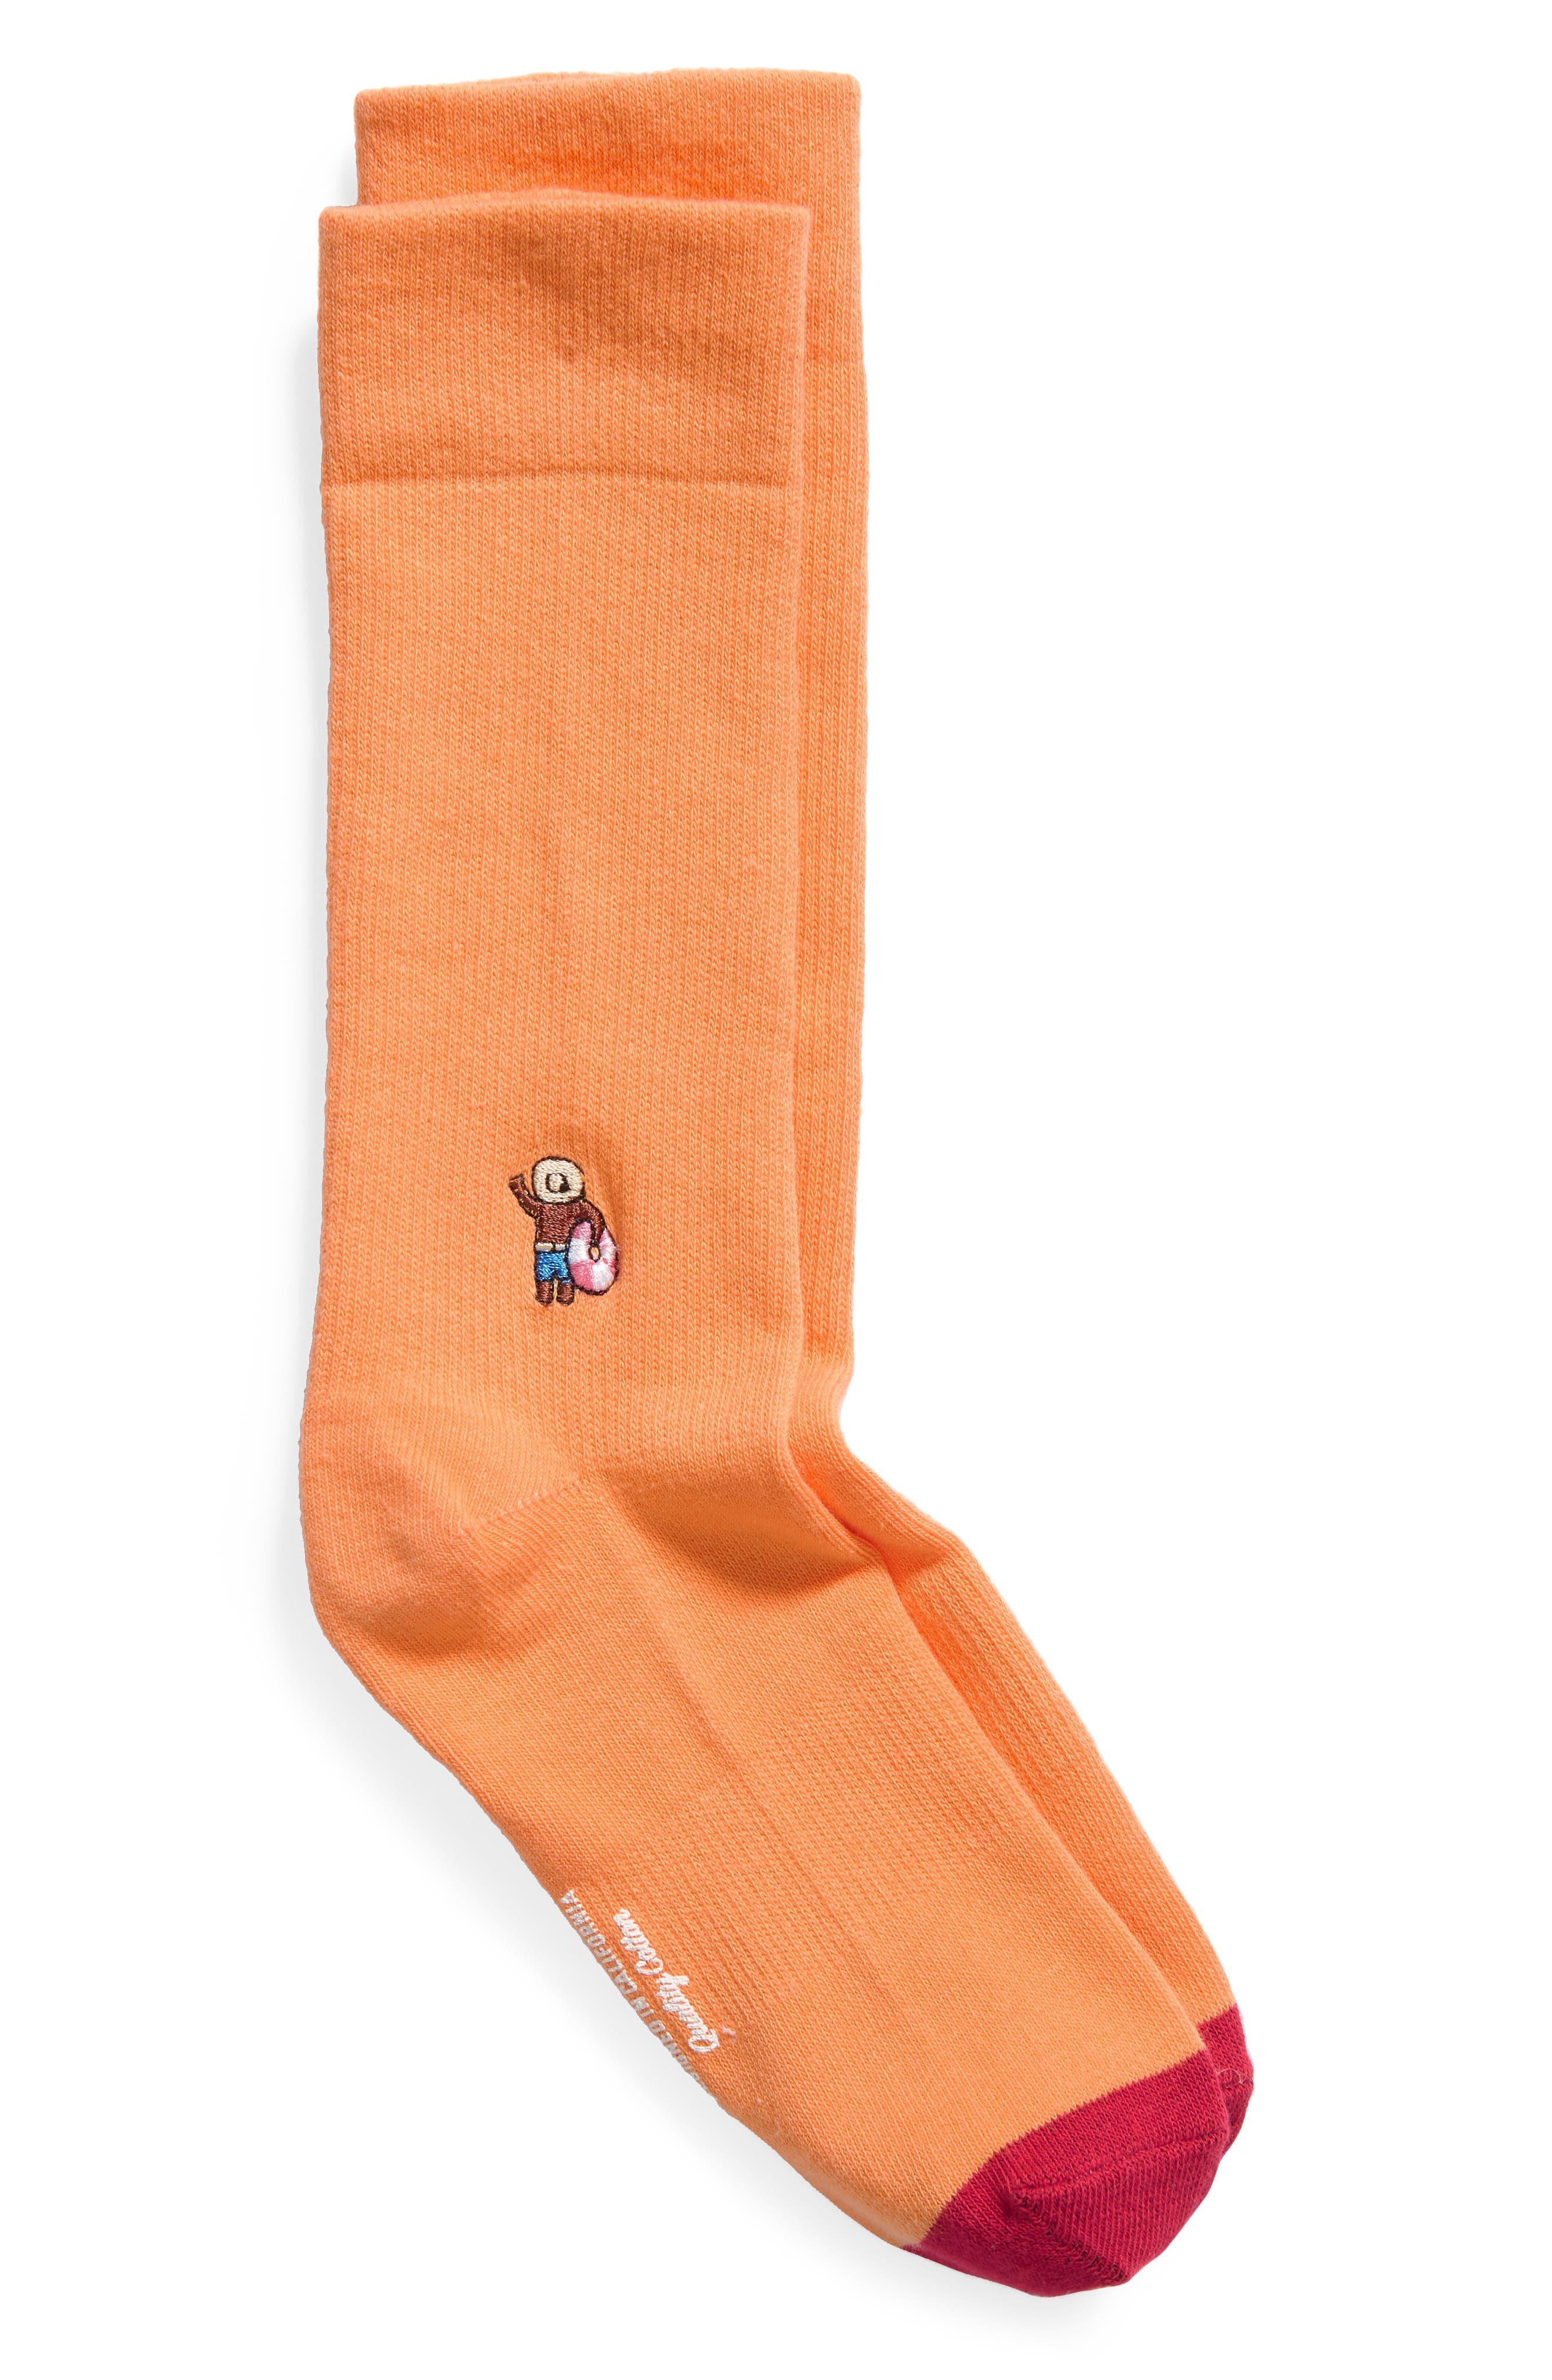 RICHER POORER Dude Everyday Crew Socks in Orange